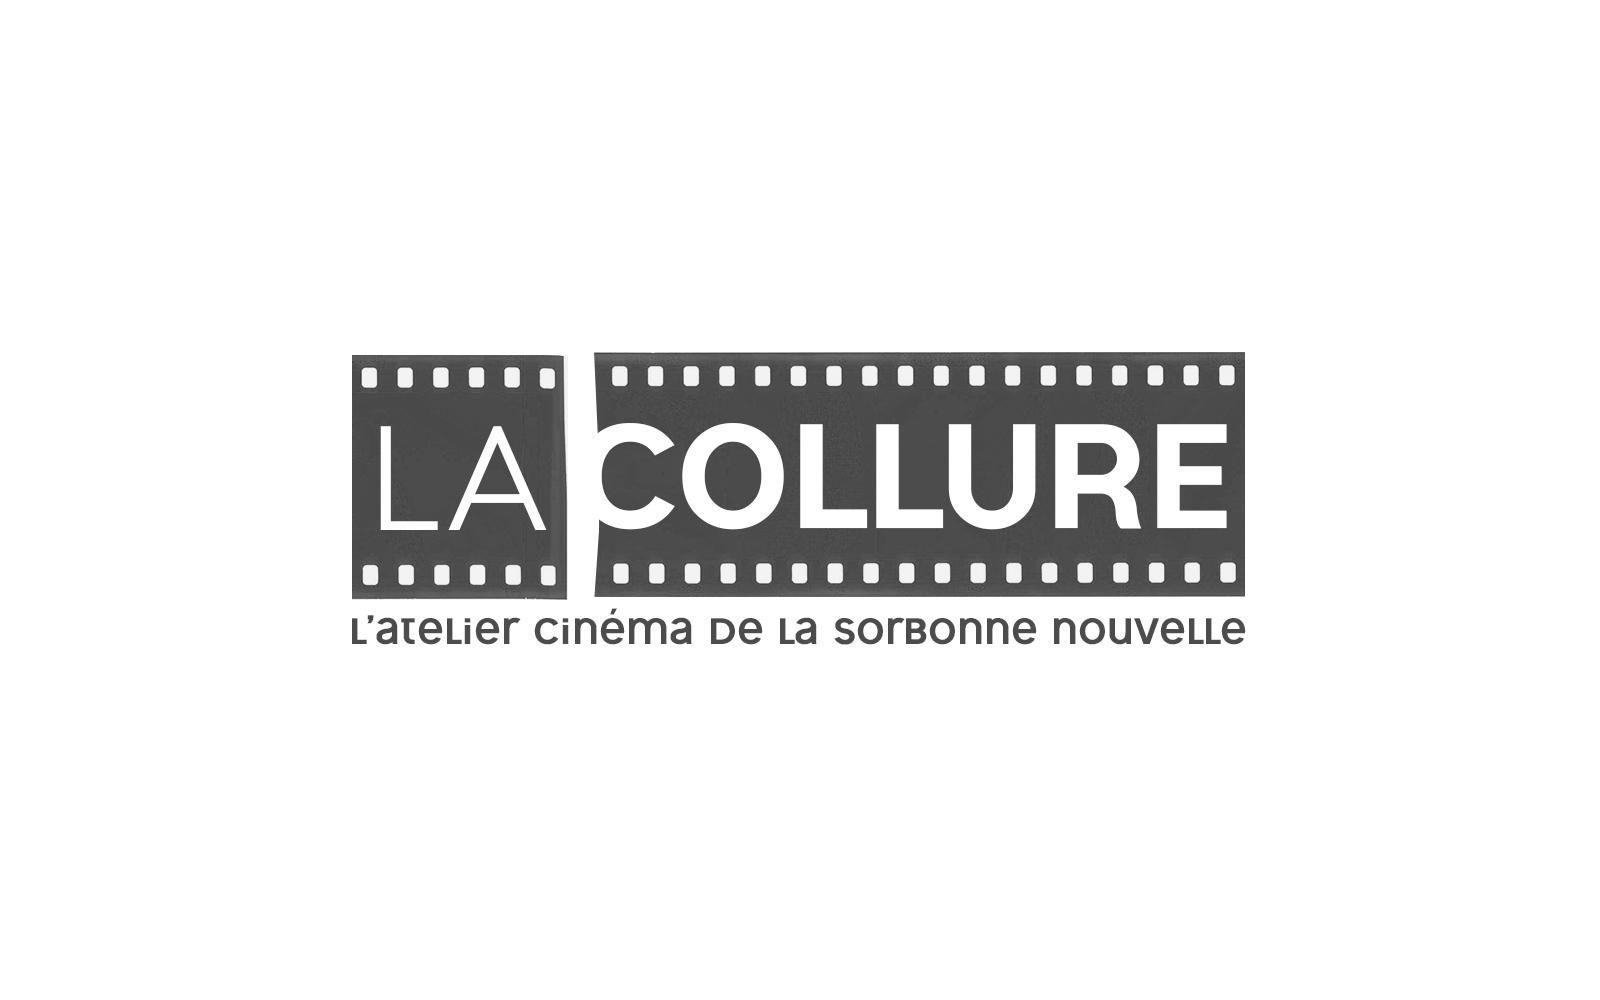 logo-la-collure-n-b.jpg